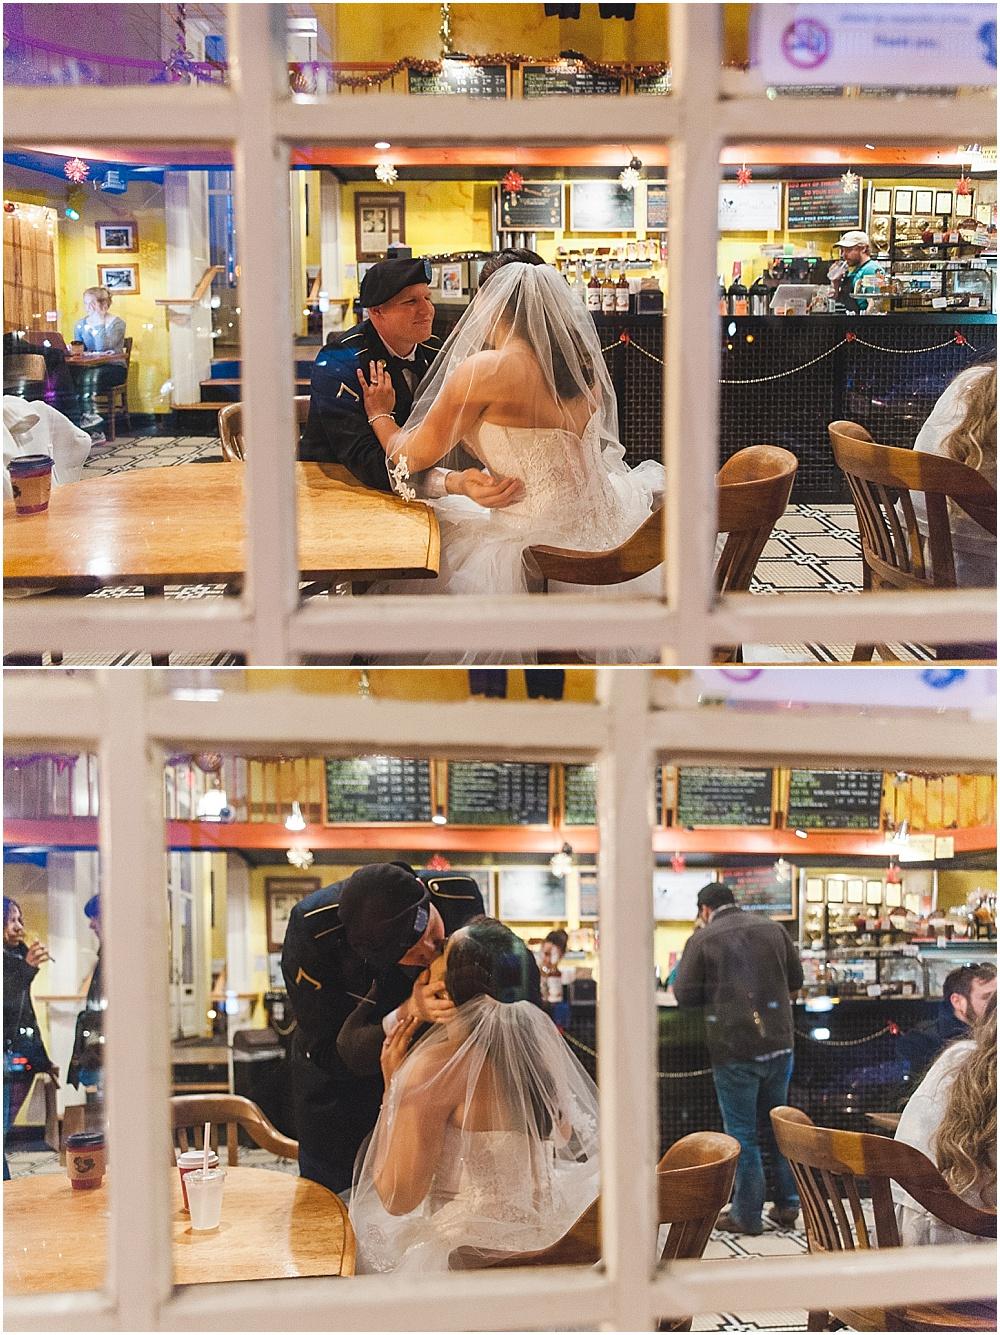 fredericksburg_lavenderheights_bedandbreakfast_wedding_9.jpg